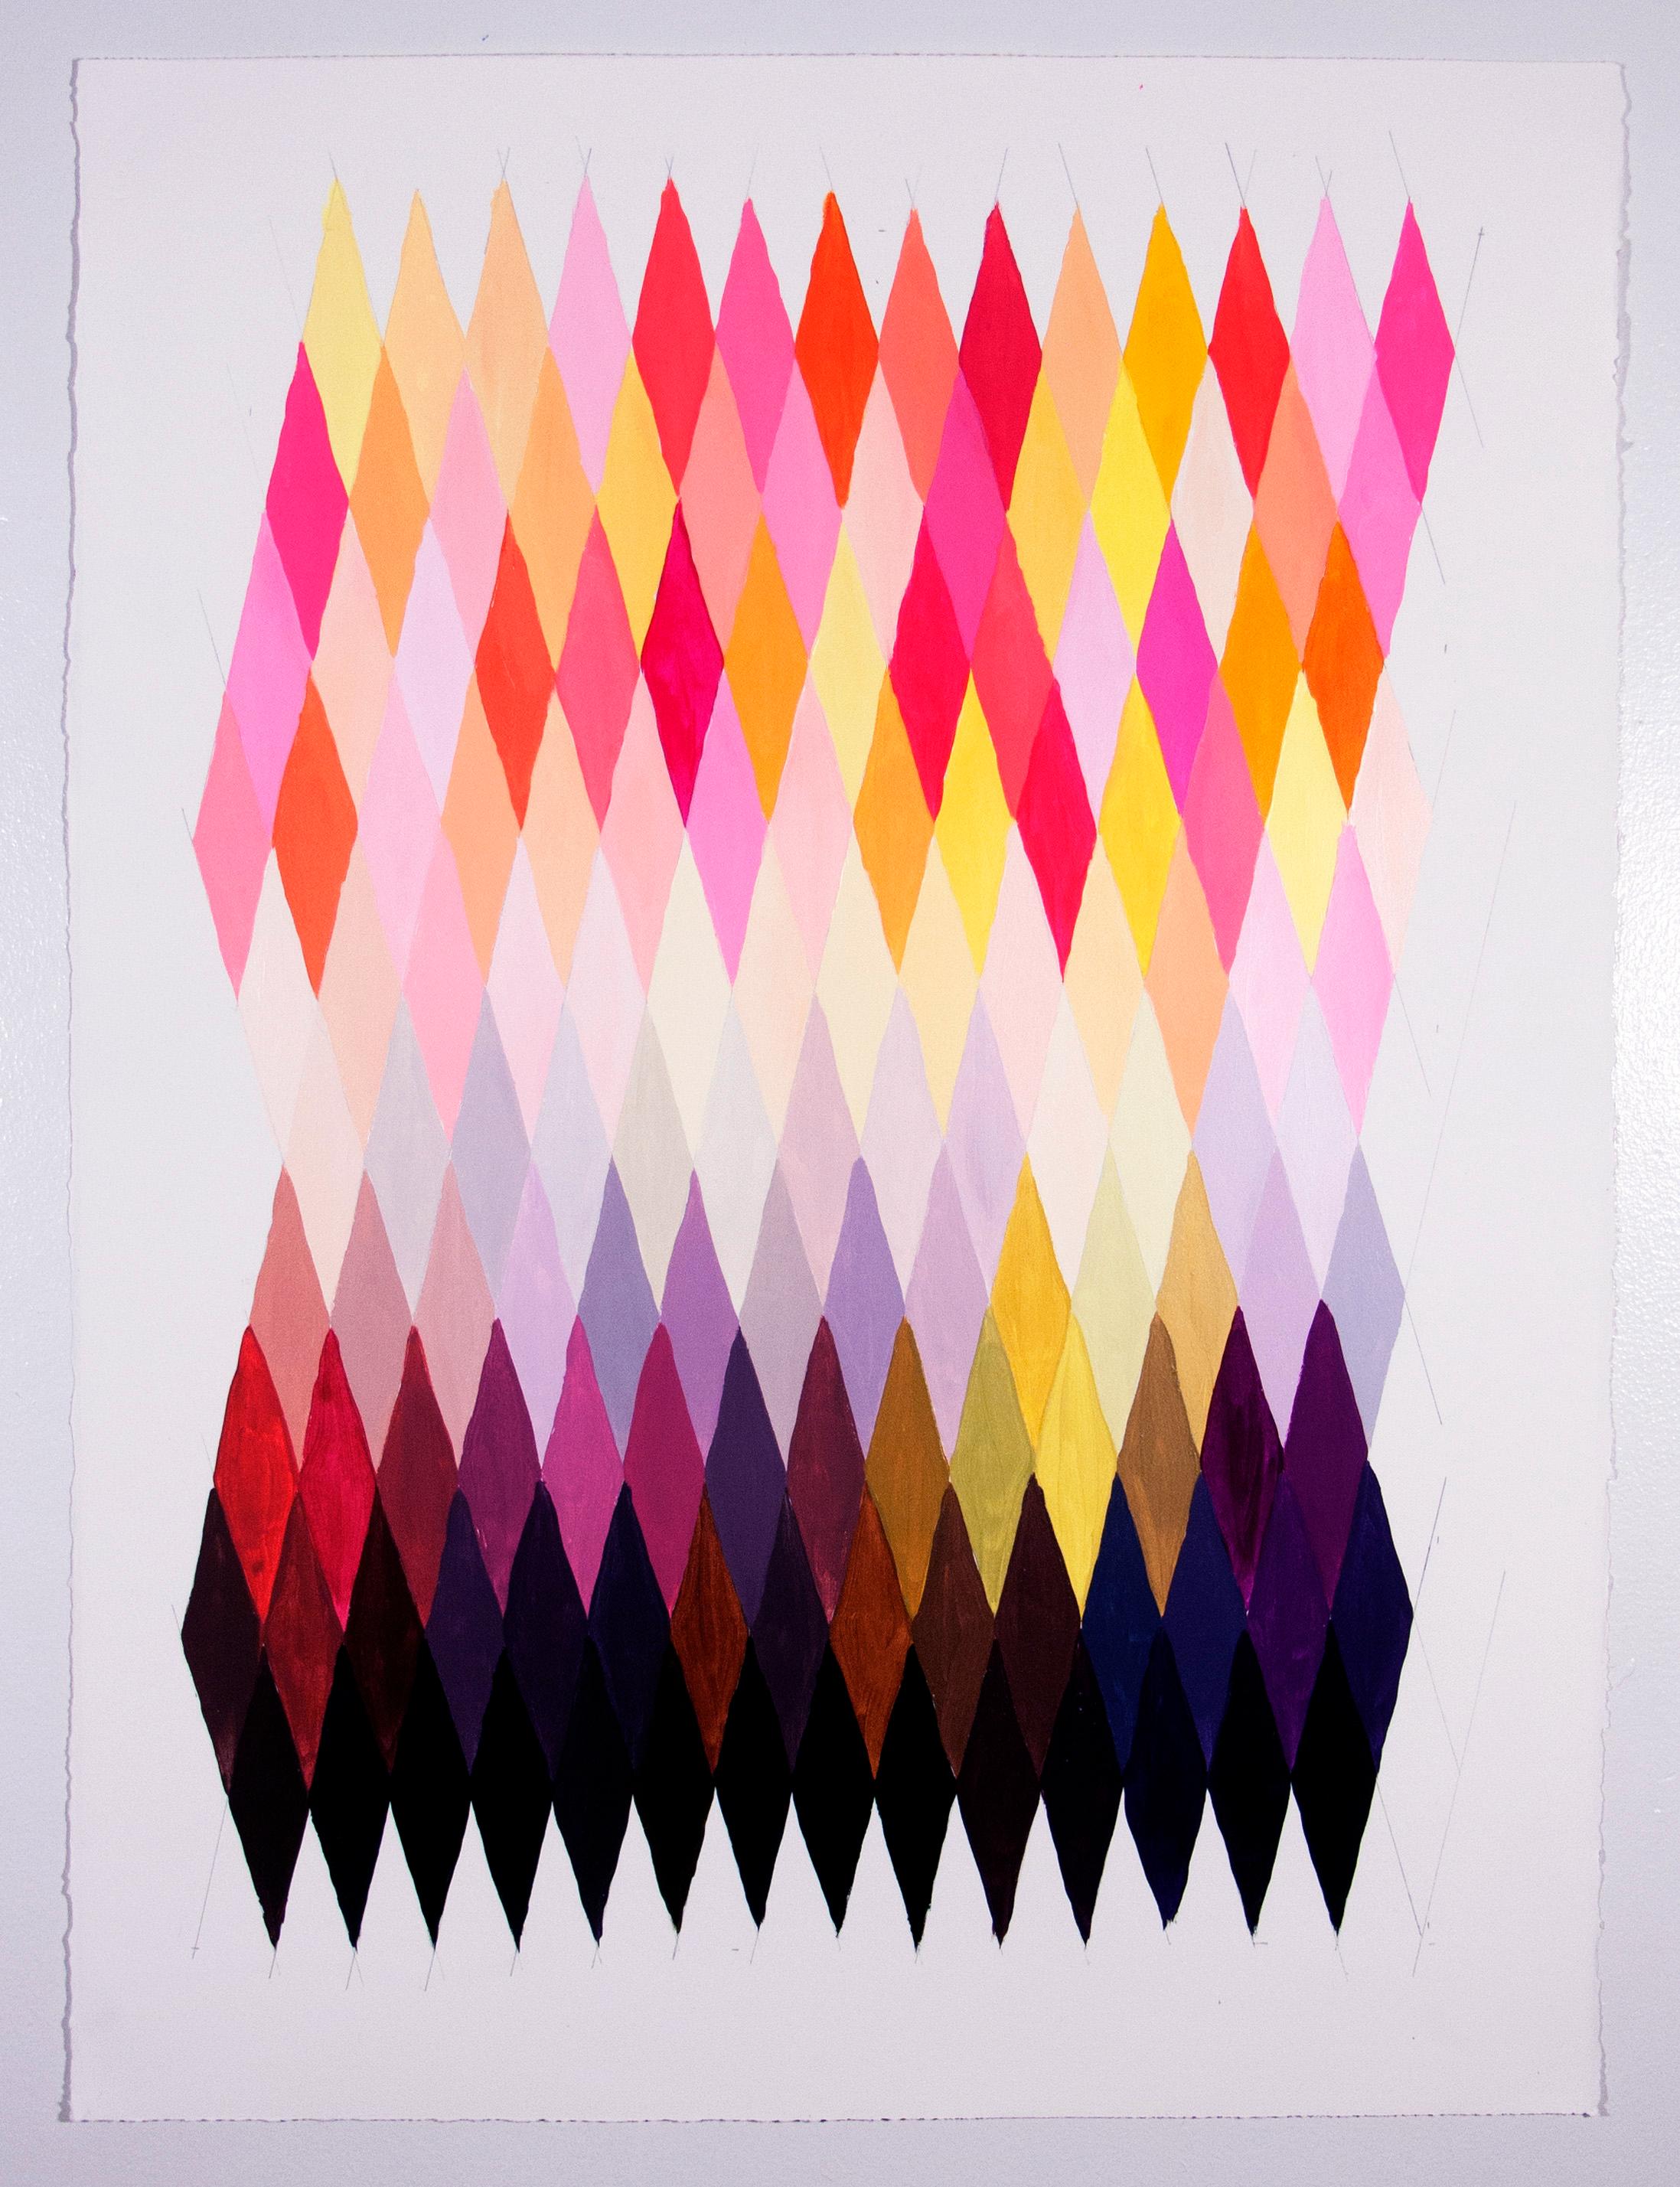 "NY16#58, 30"" X 22"", acrylic on paper, 2016 available at  Chairish"